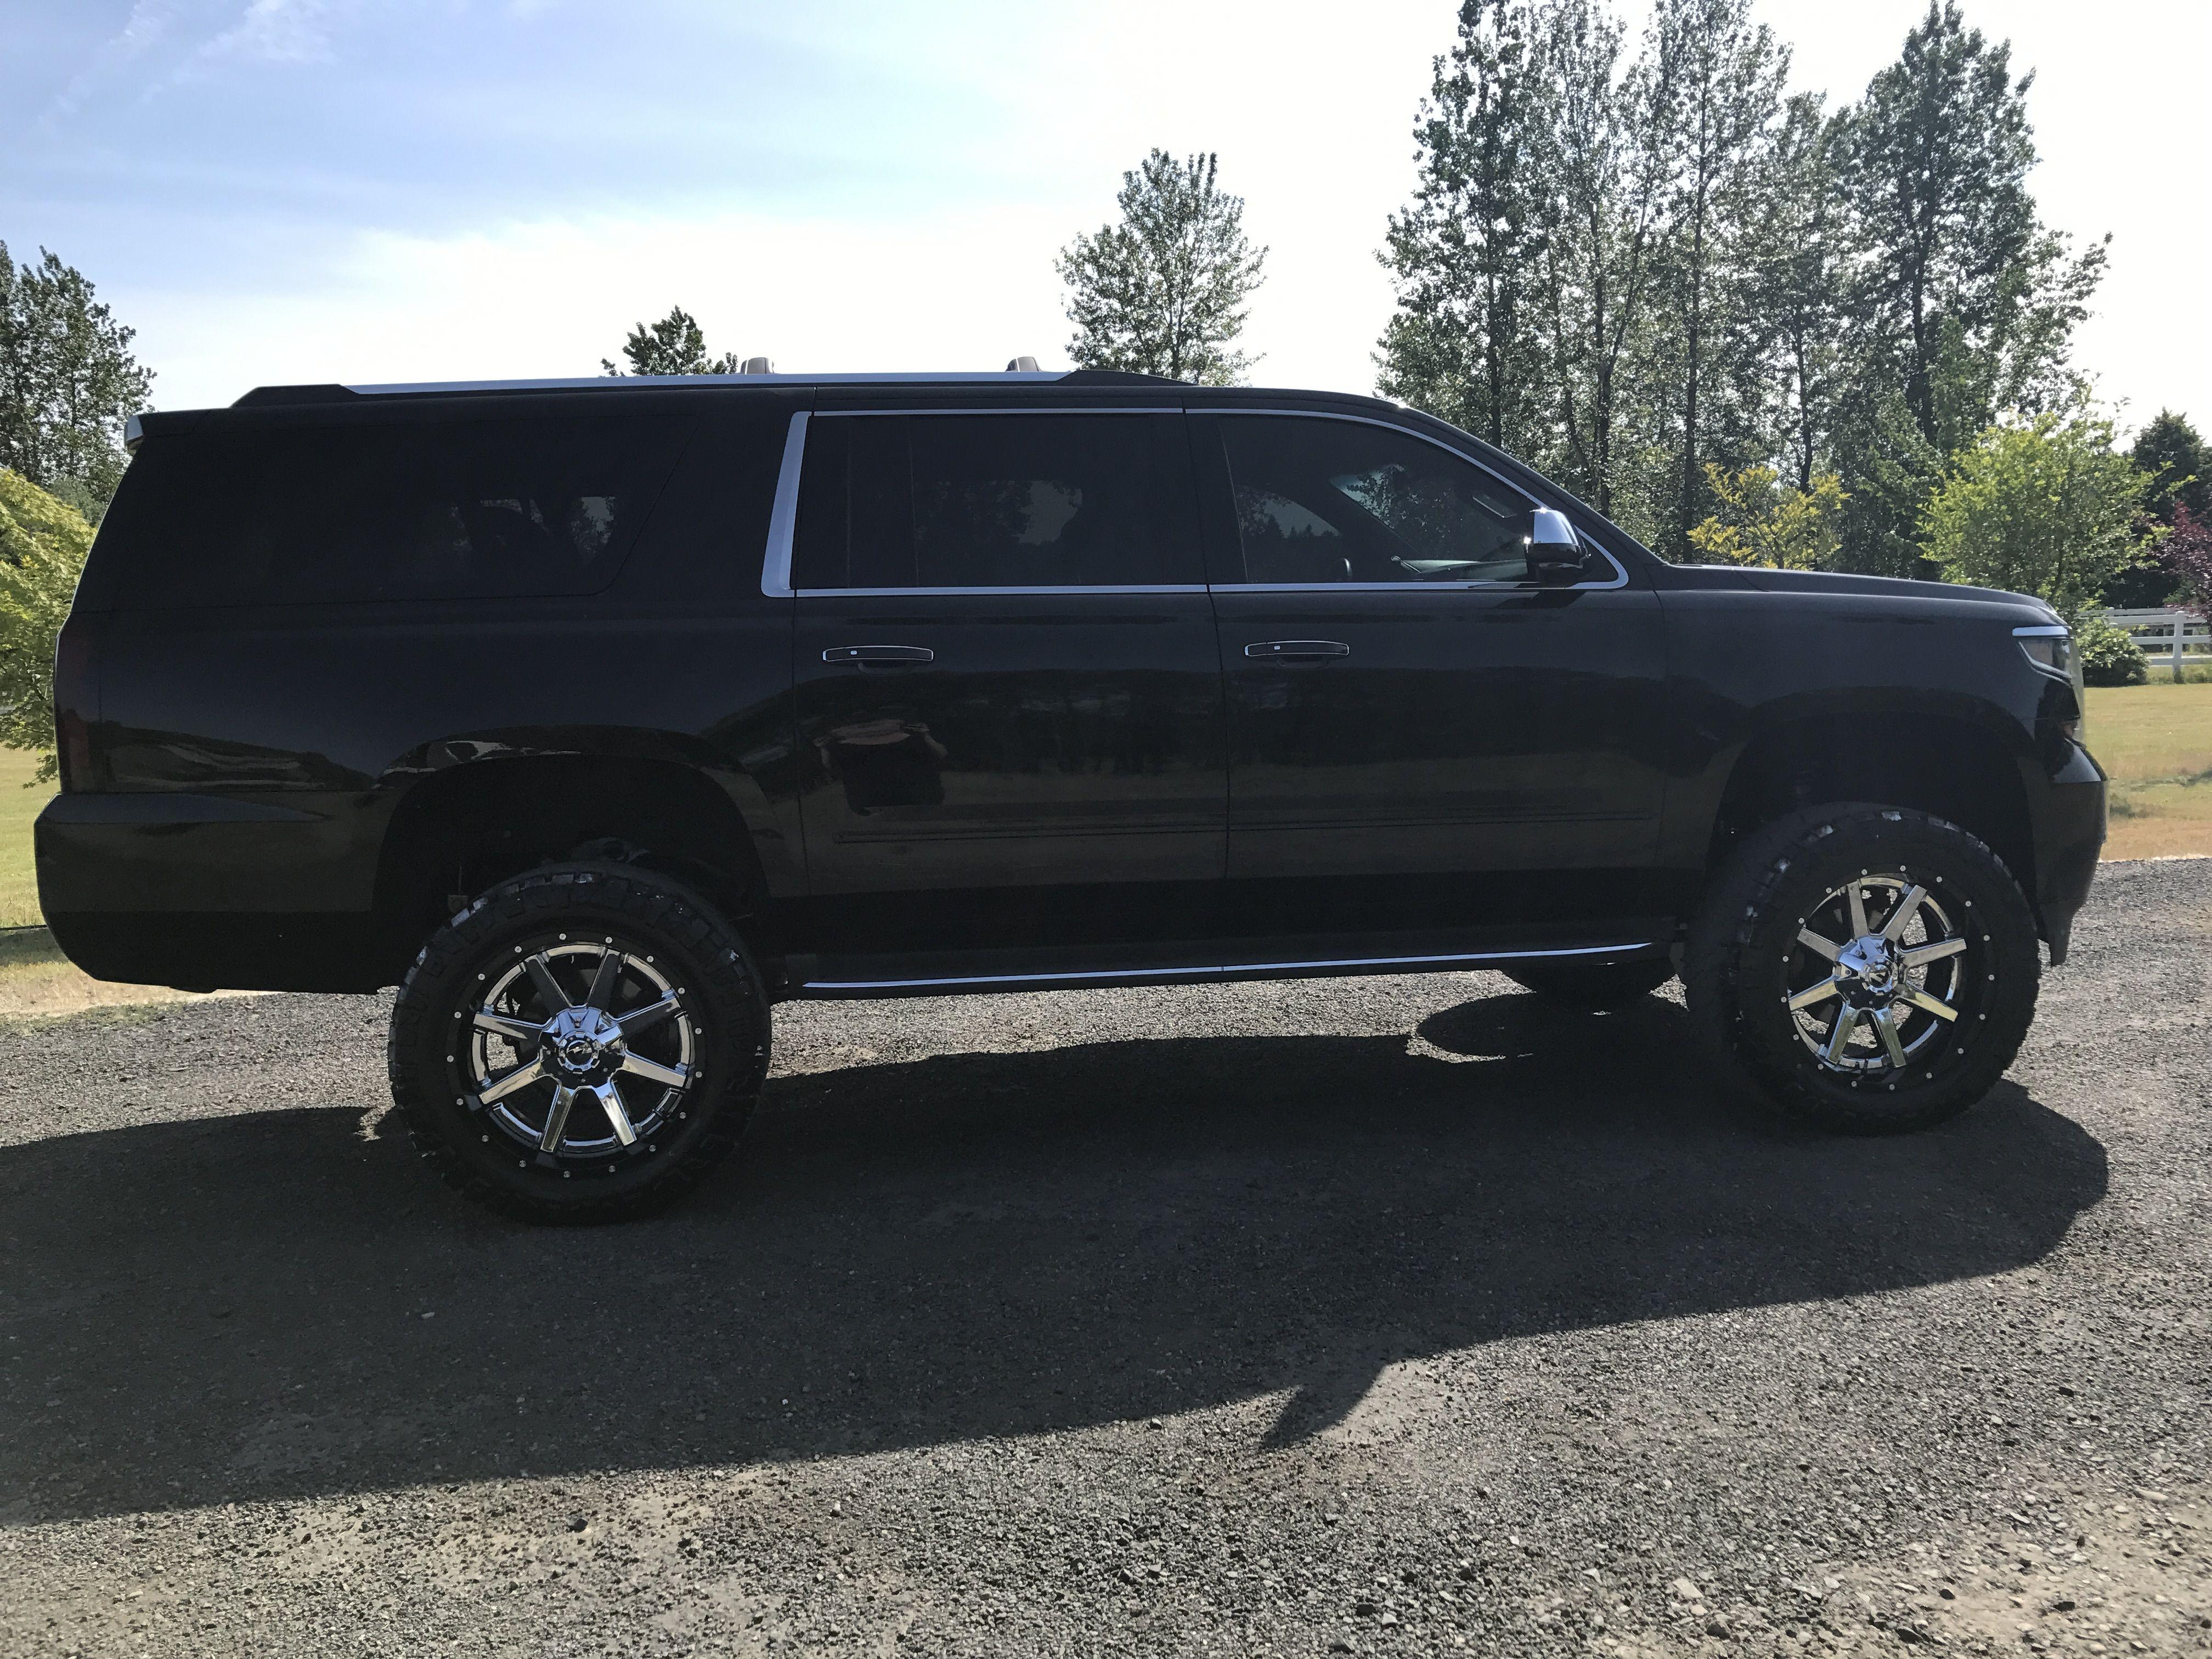 medium resolution of 2015 lifted suburban 22 fuel rims on 35 tires 6 fabtech lift